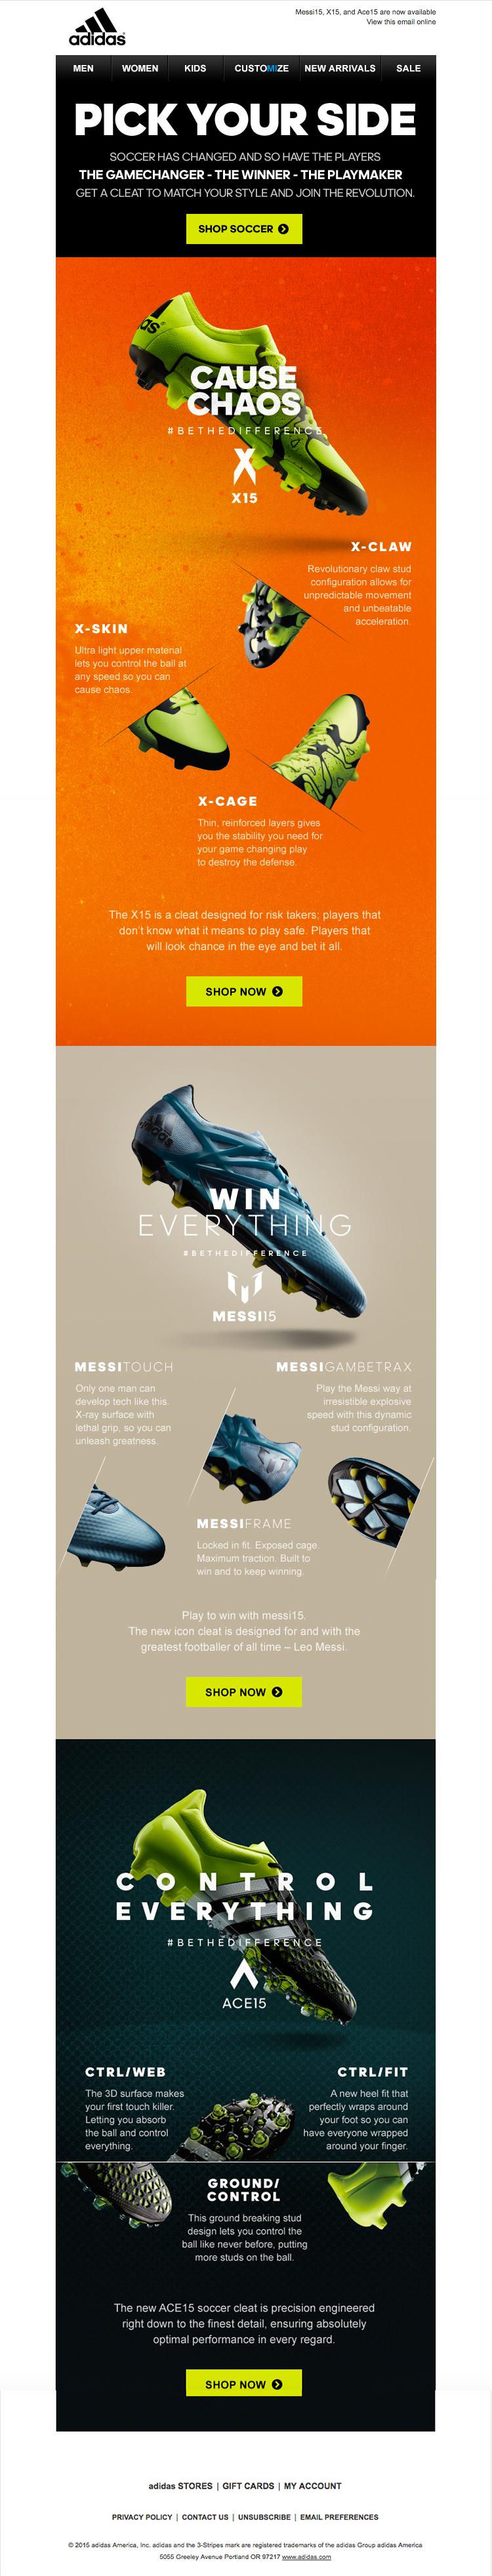 Redundante otoño Visión  adidas. #newsletter. #emailers. Bundle of Ideas.   Desain